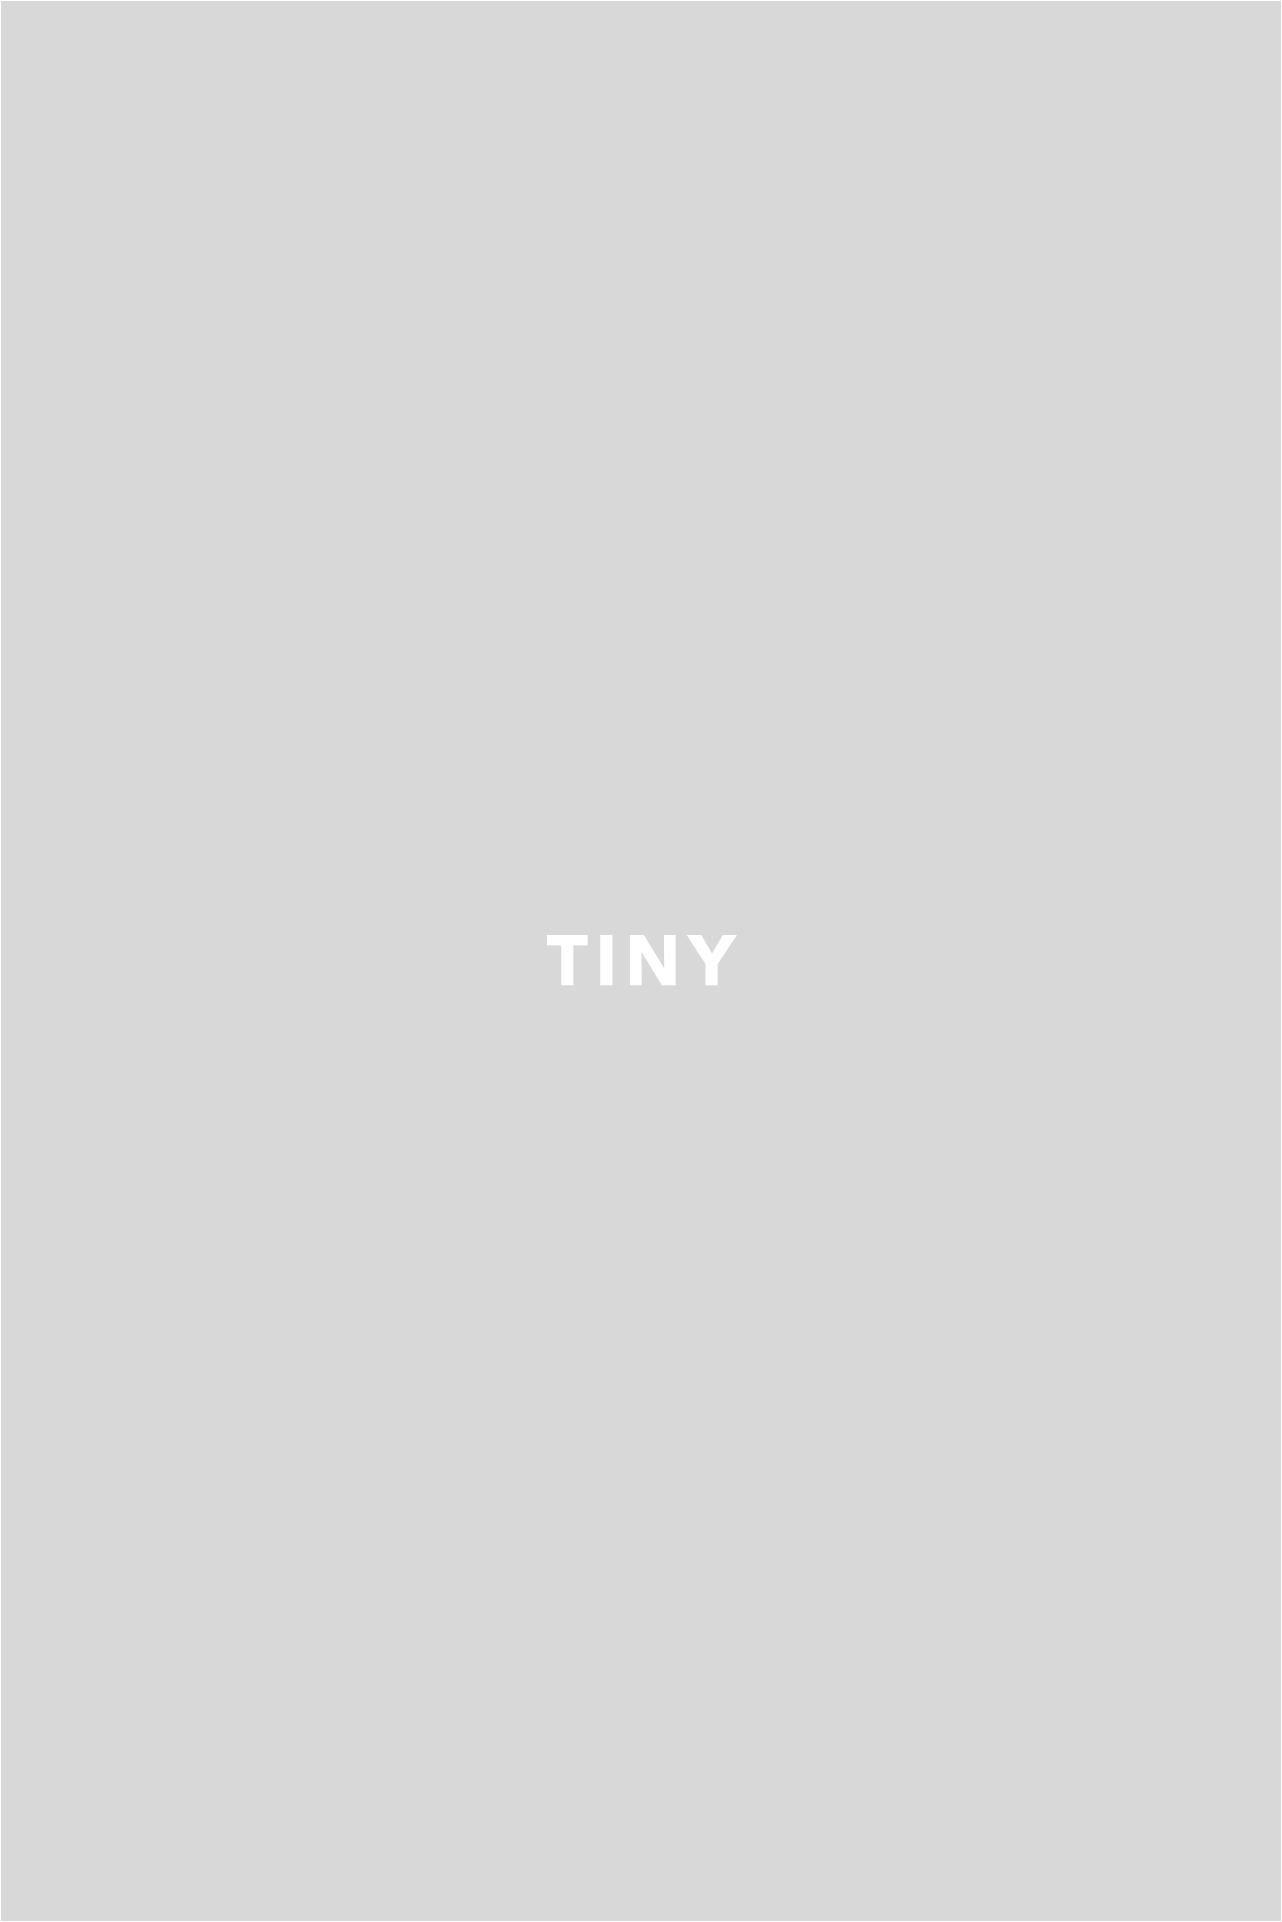 BODY TRUE LOVE